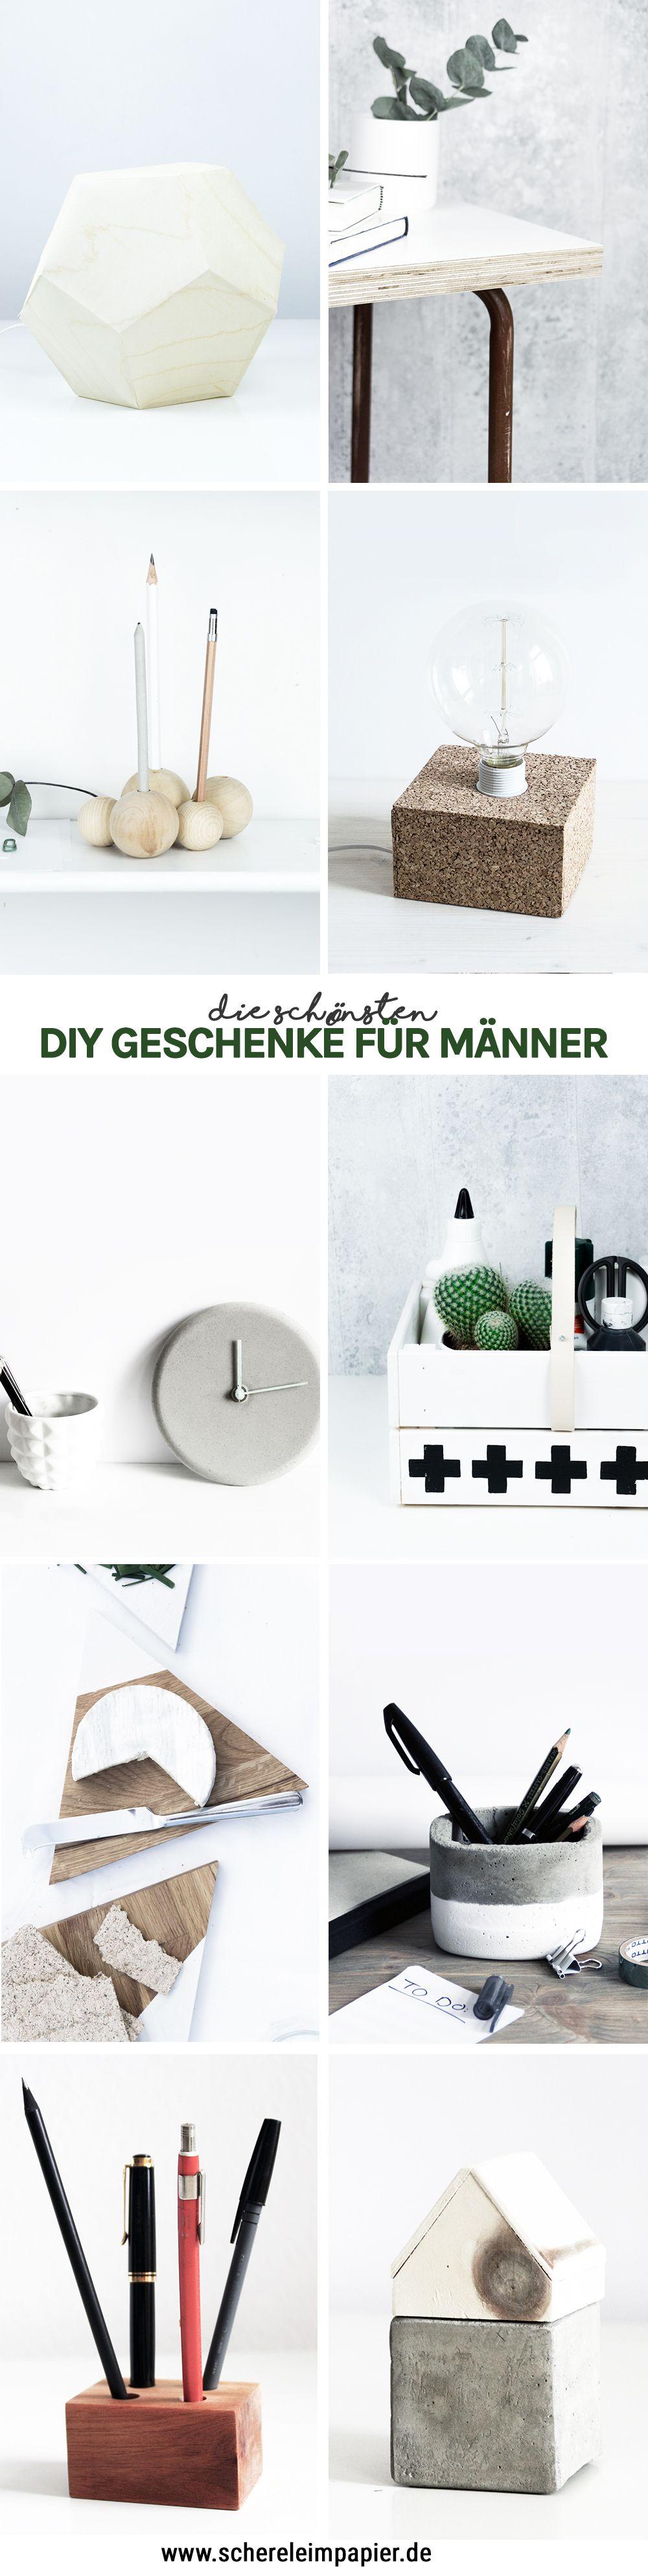 DIY Geschenke für Männer selber machen - 10 kreative Ideen ...